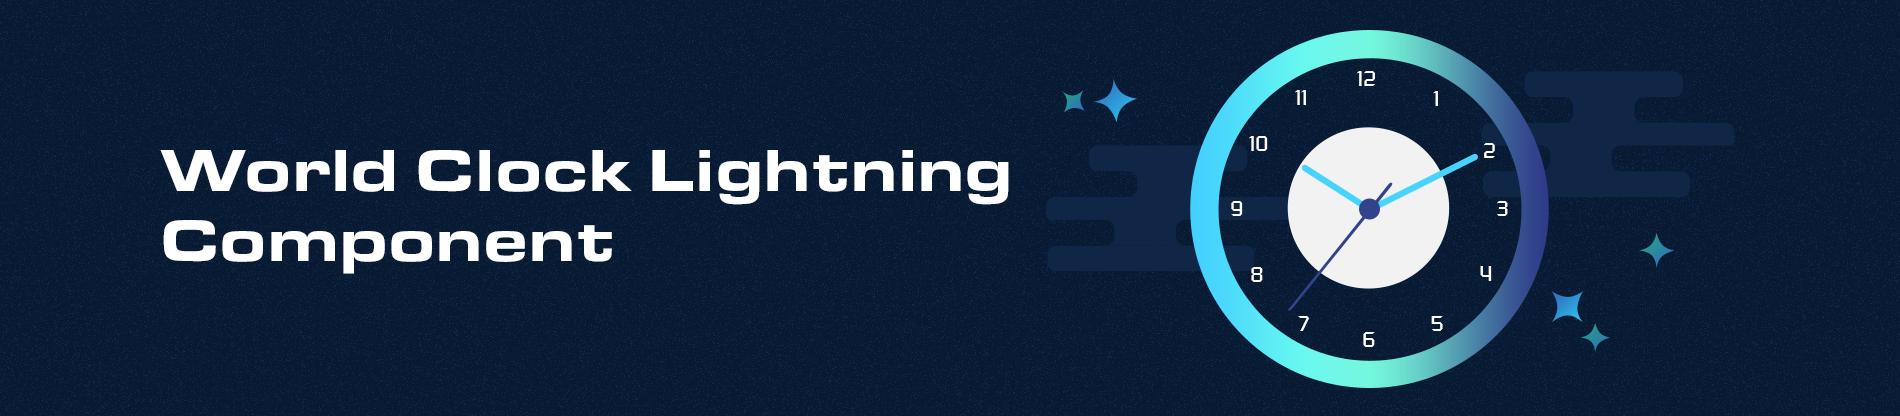 World Clock Lightning Component